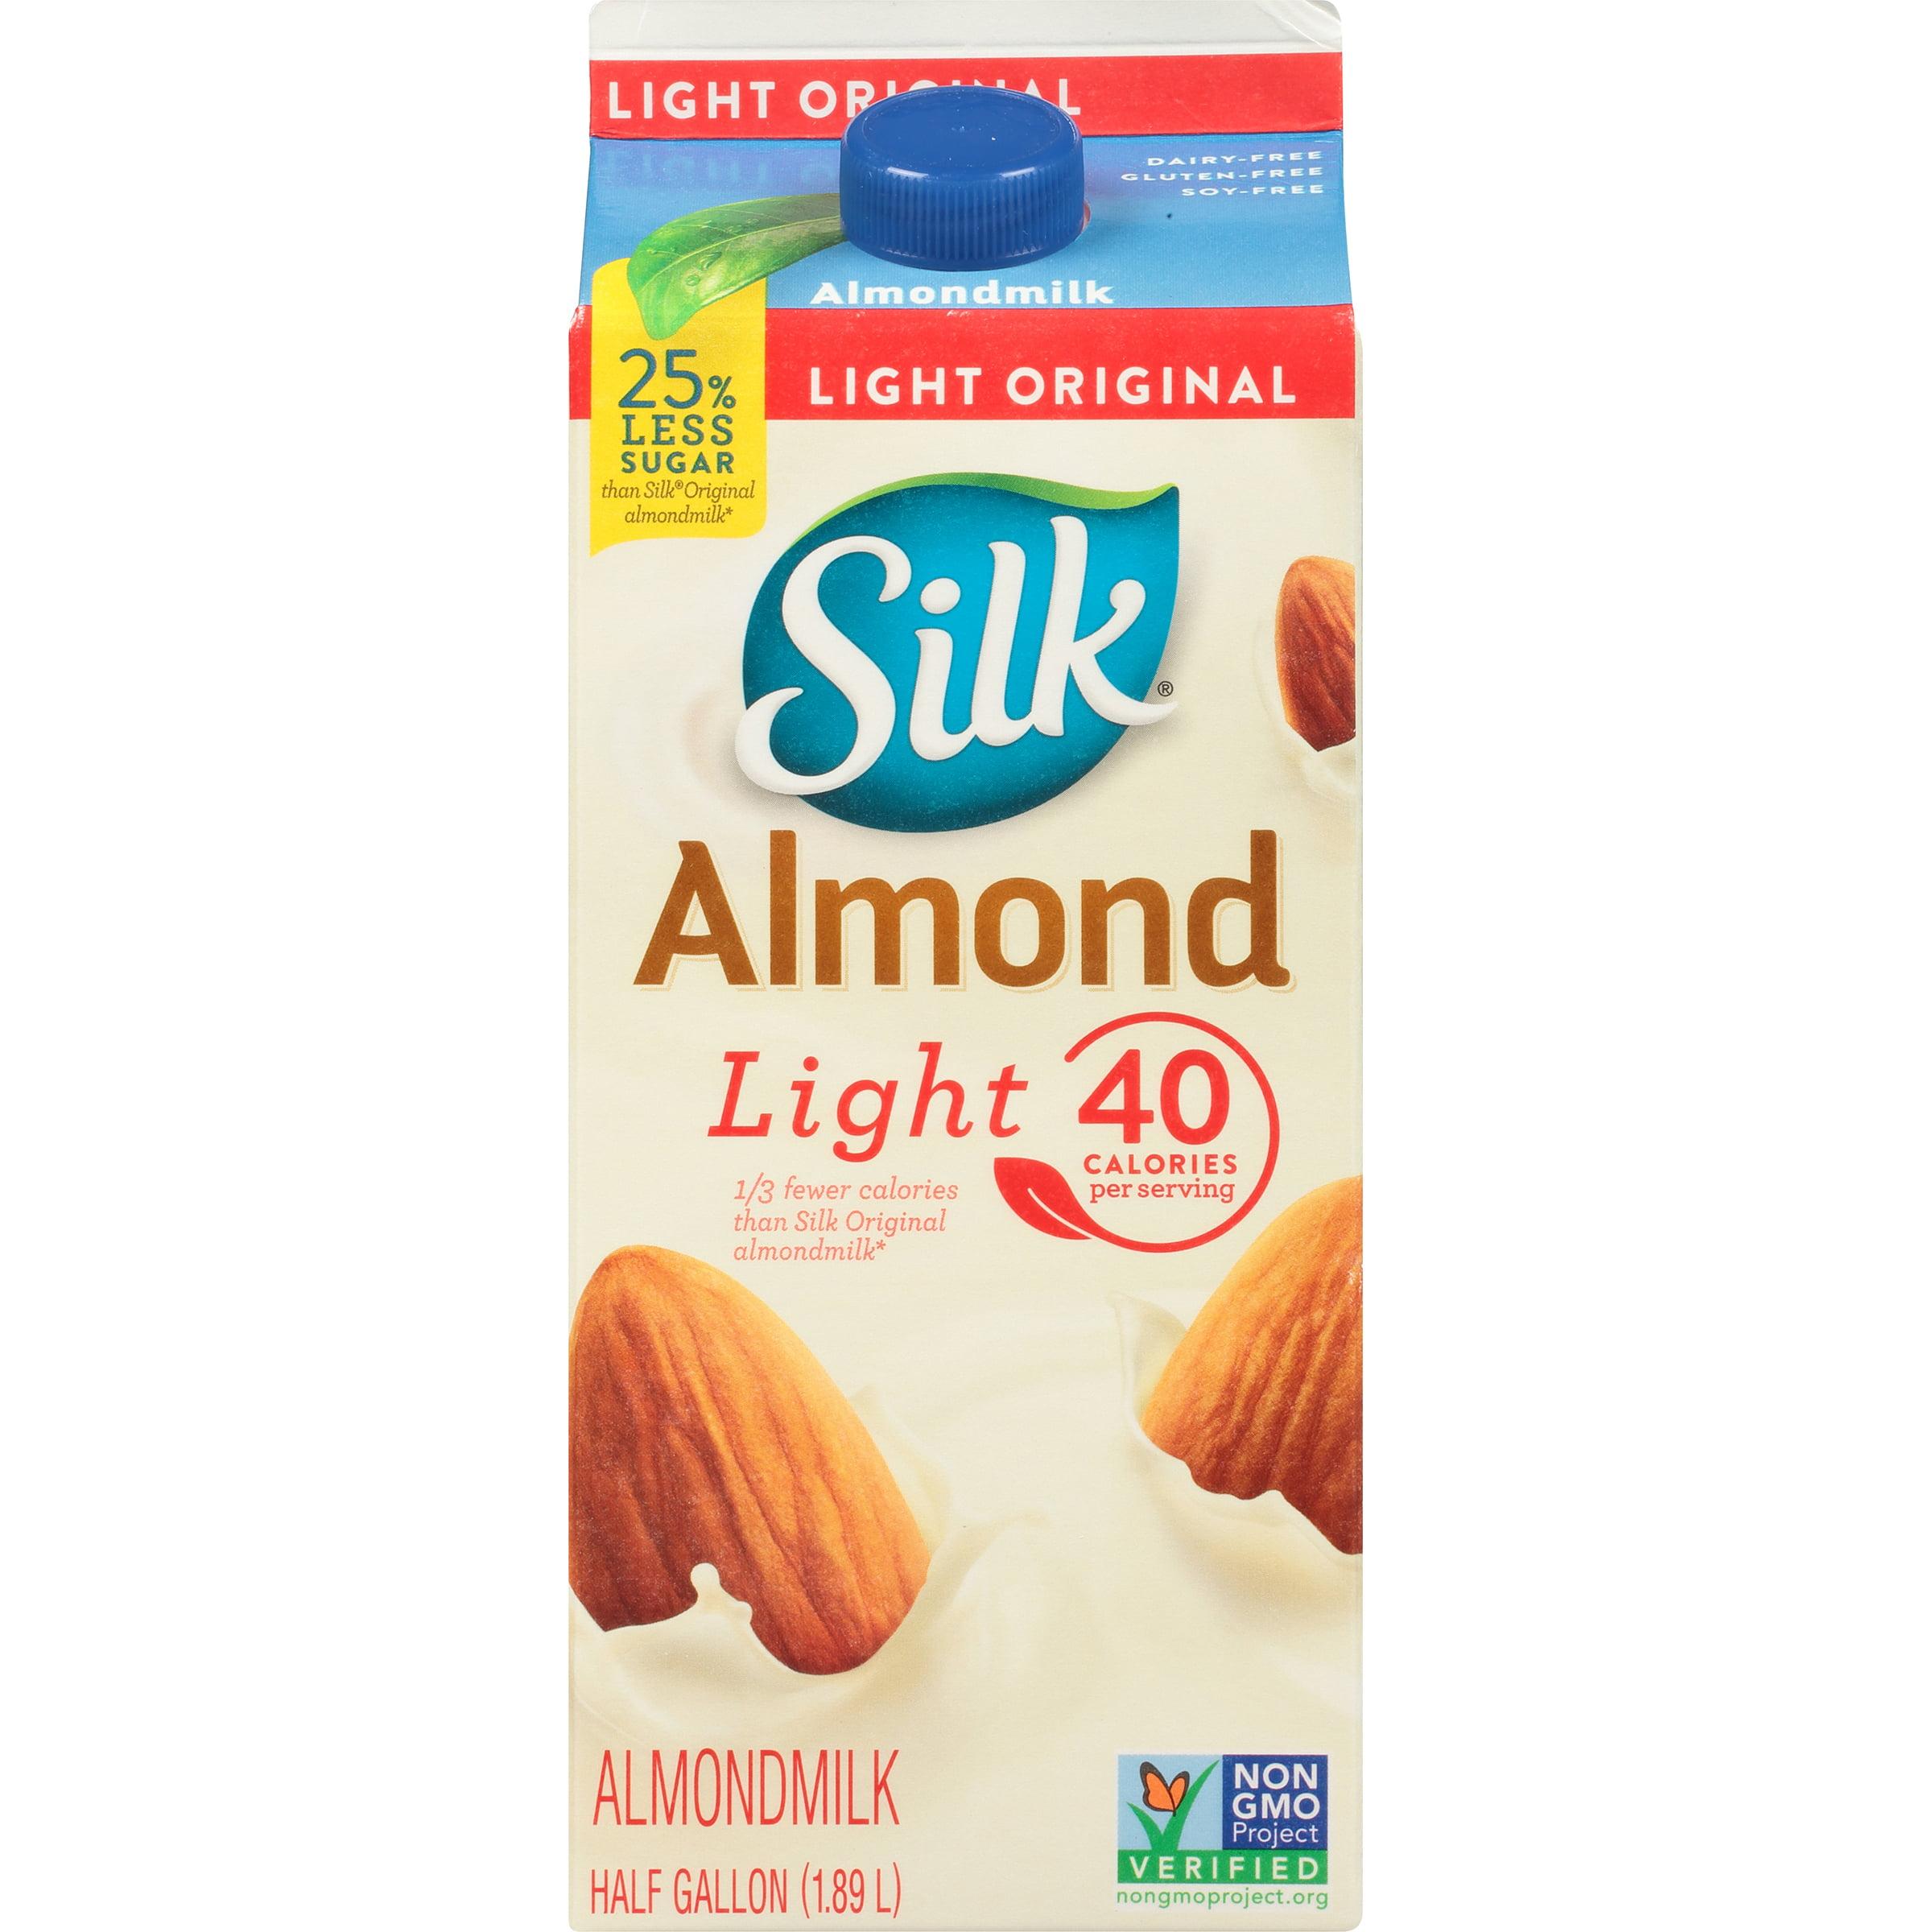 Original Light Almondmilk, Half Gallon